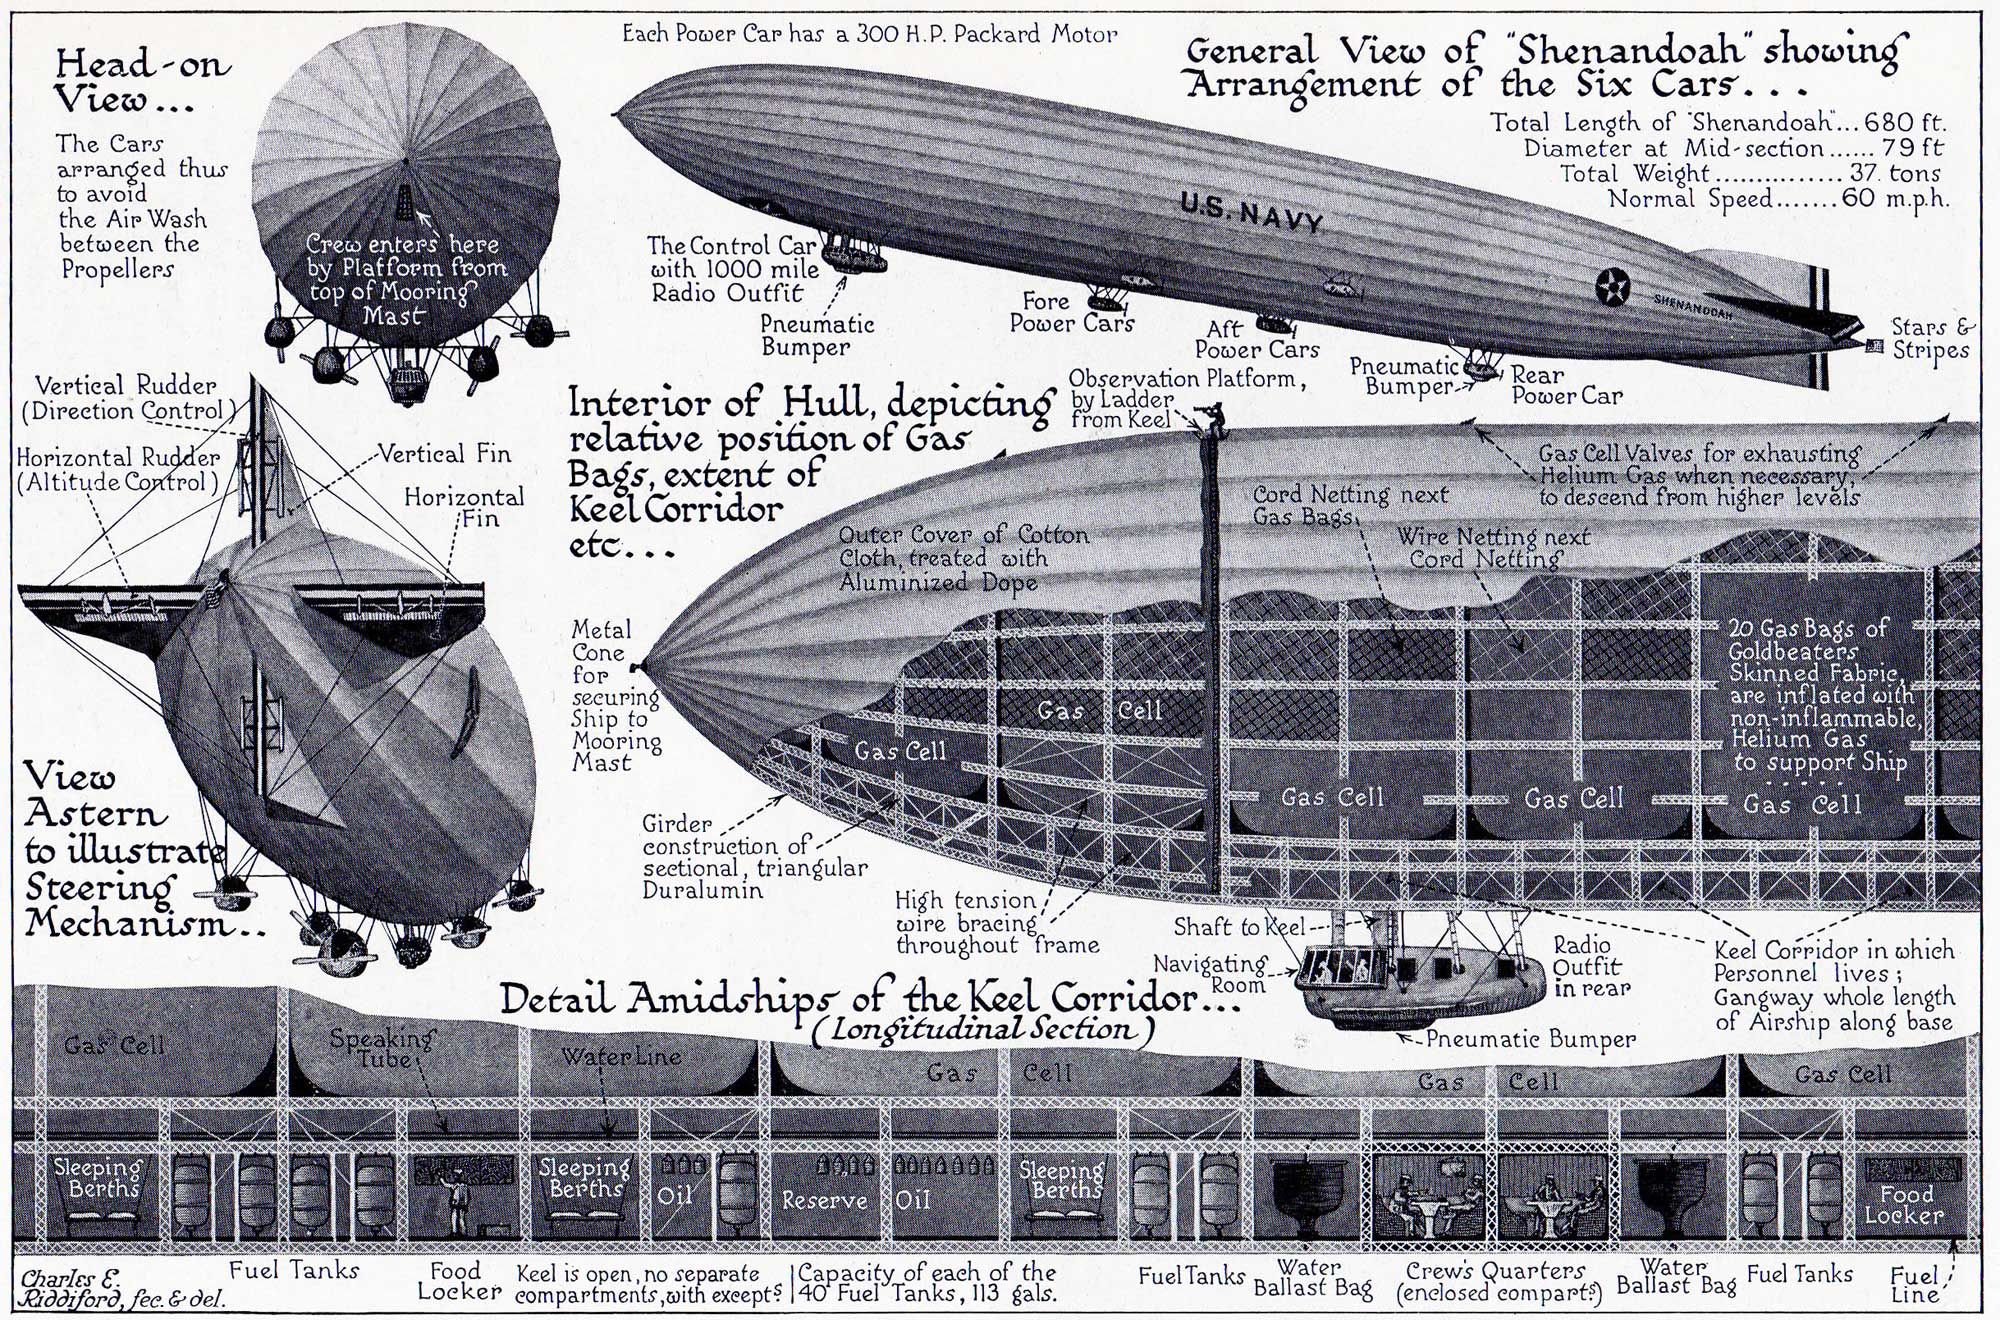 Shenandoah Diagrams Showing Arrangement Of The Six Cars